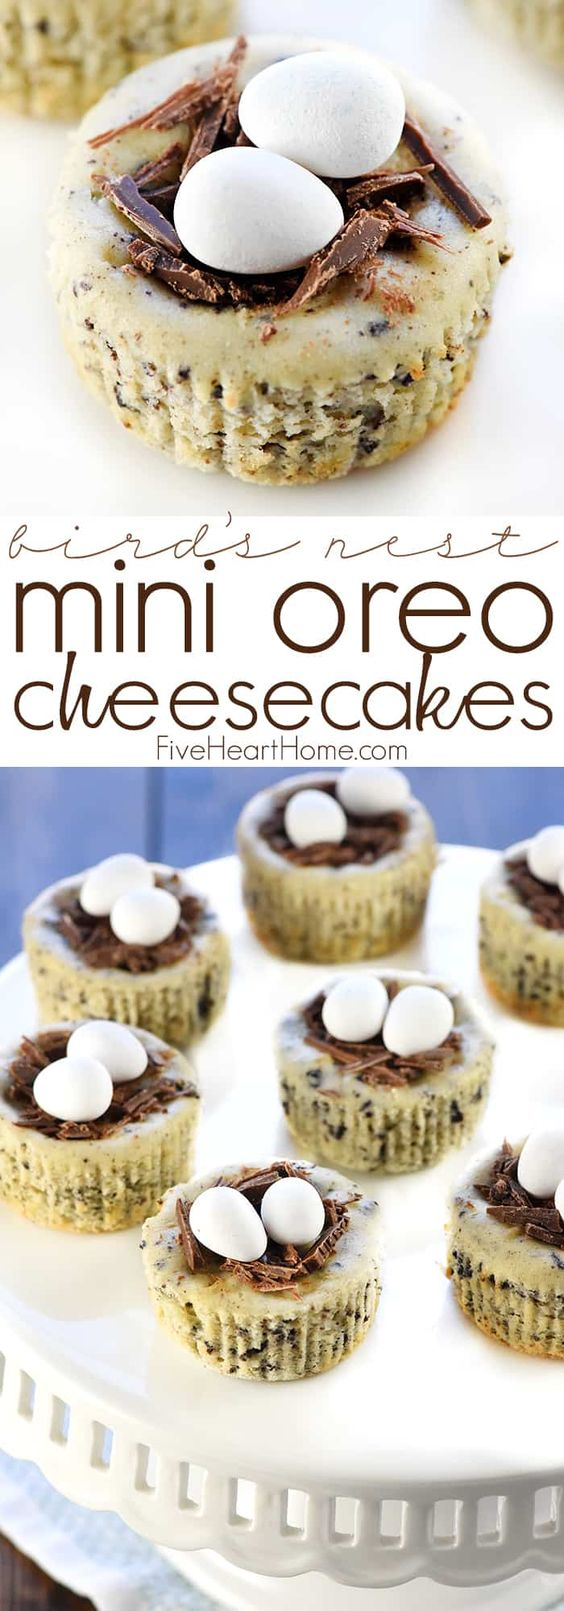 Bird's Nest Mini Oreo Cheesecakes